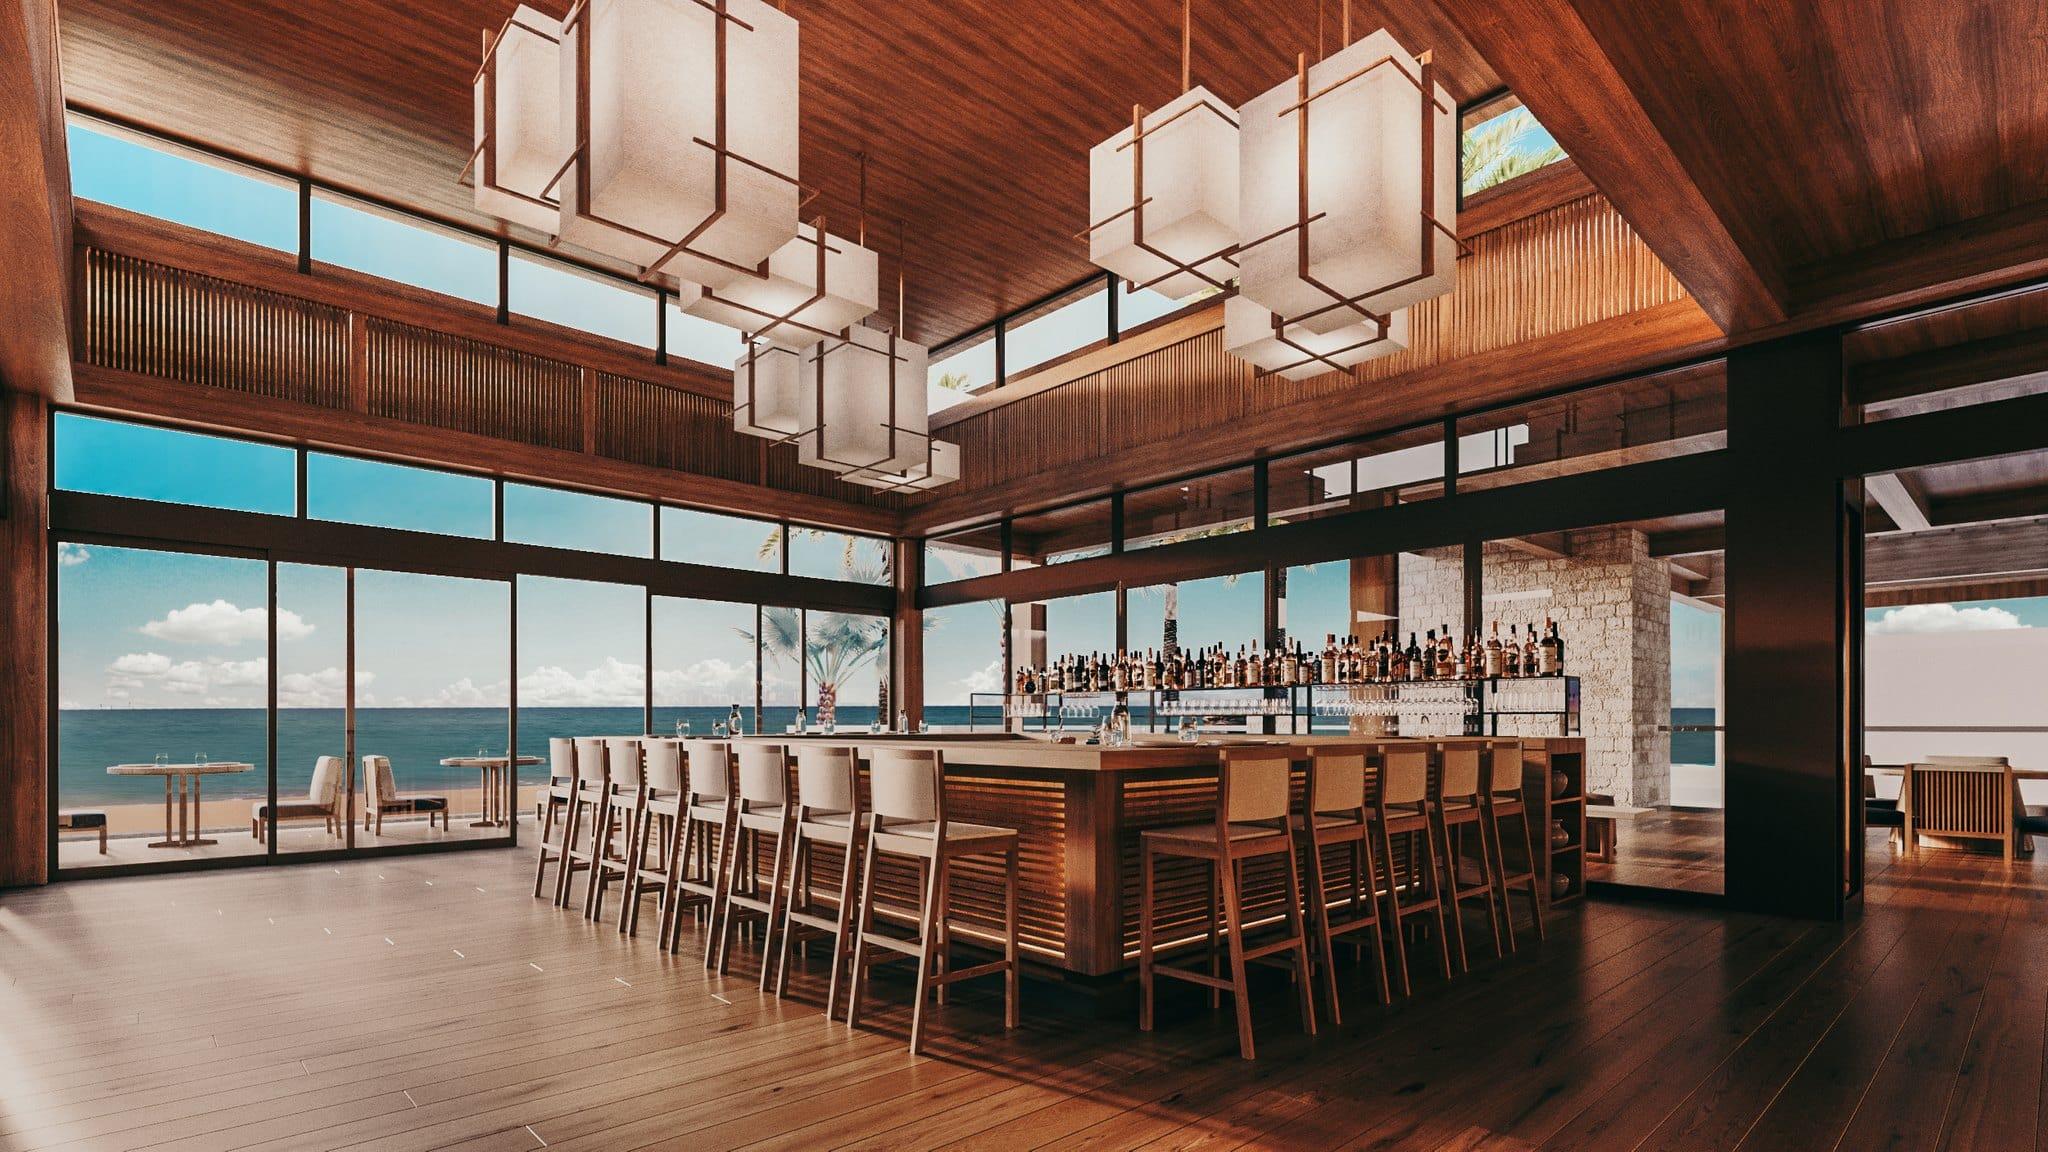 Nobu Cabo San Lucas Hotel and Restaurant